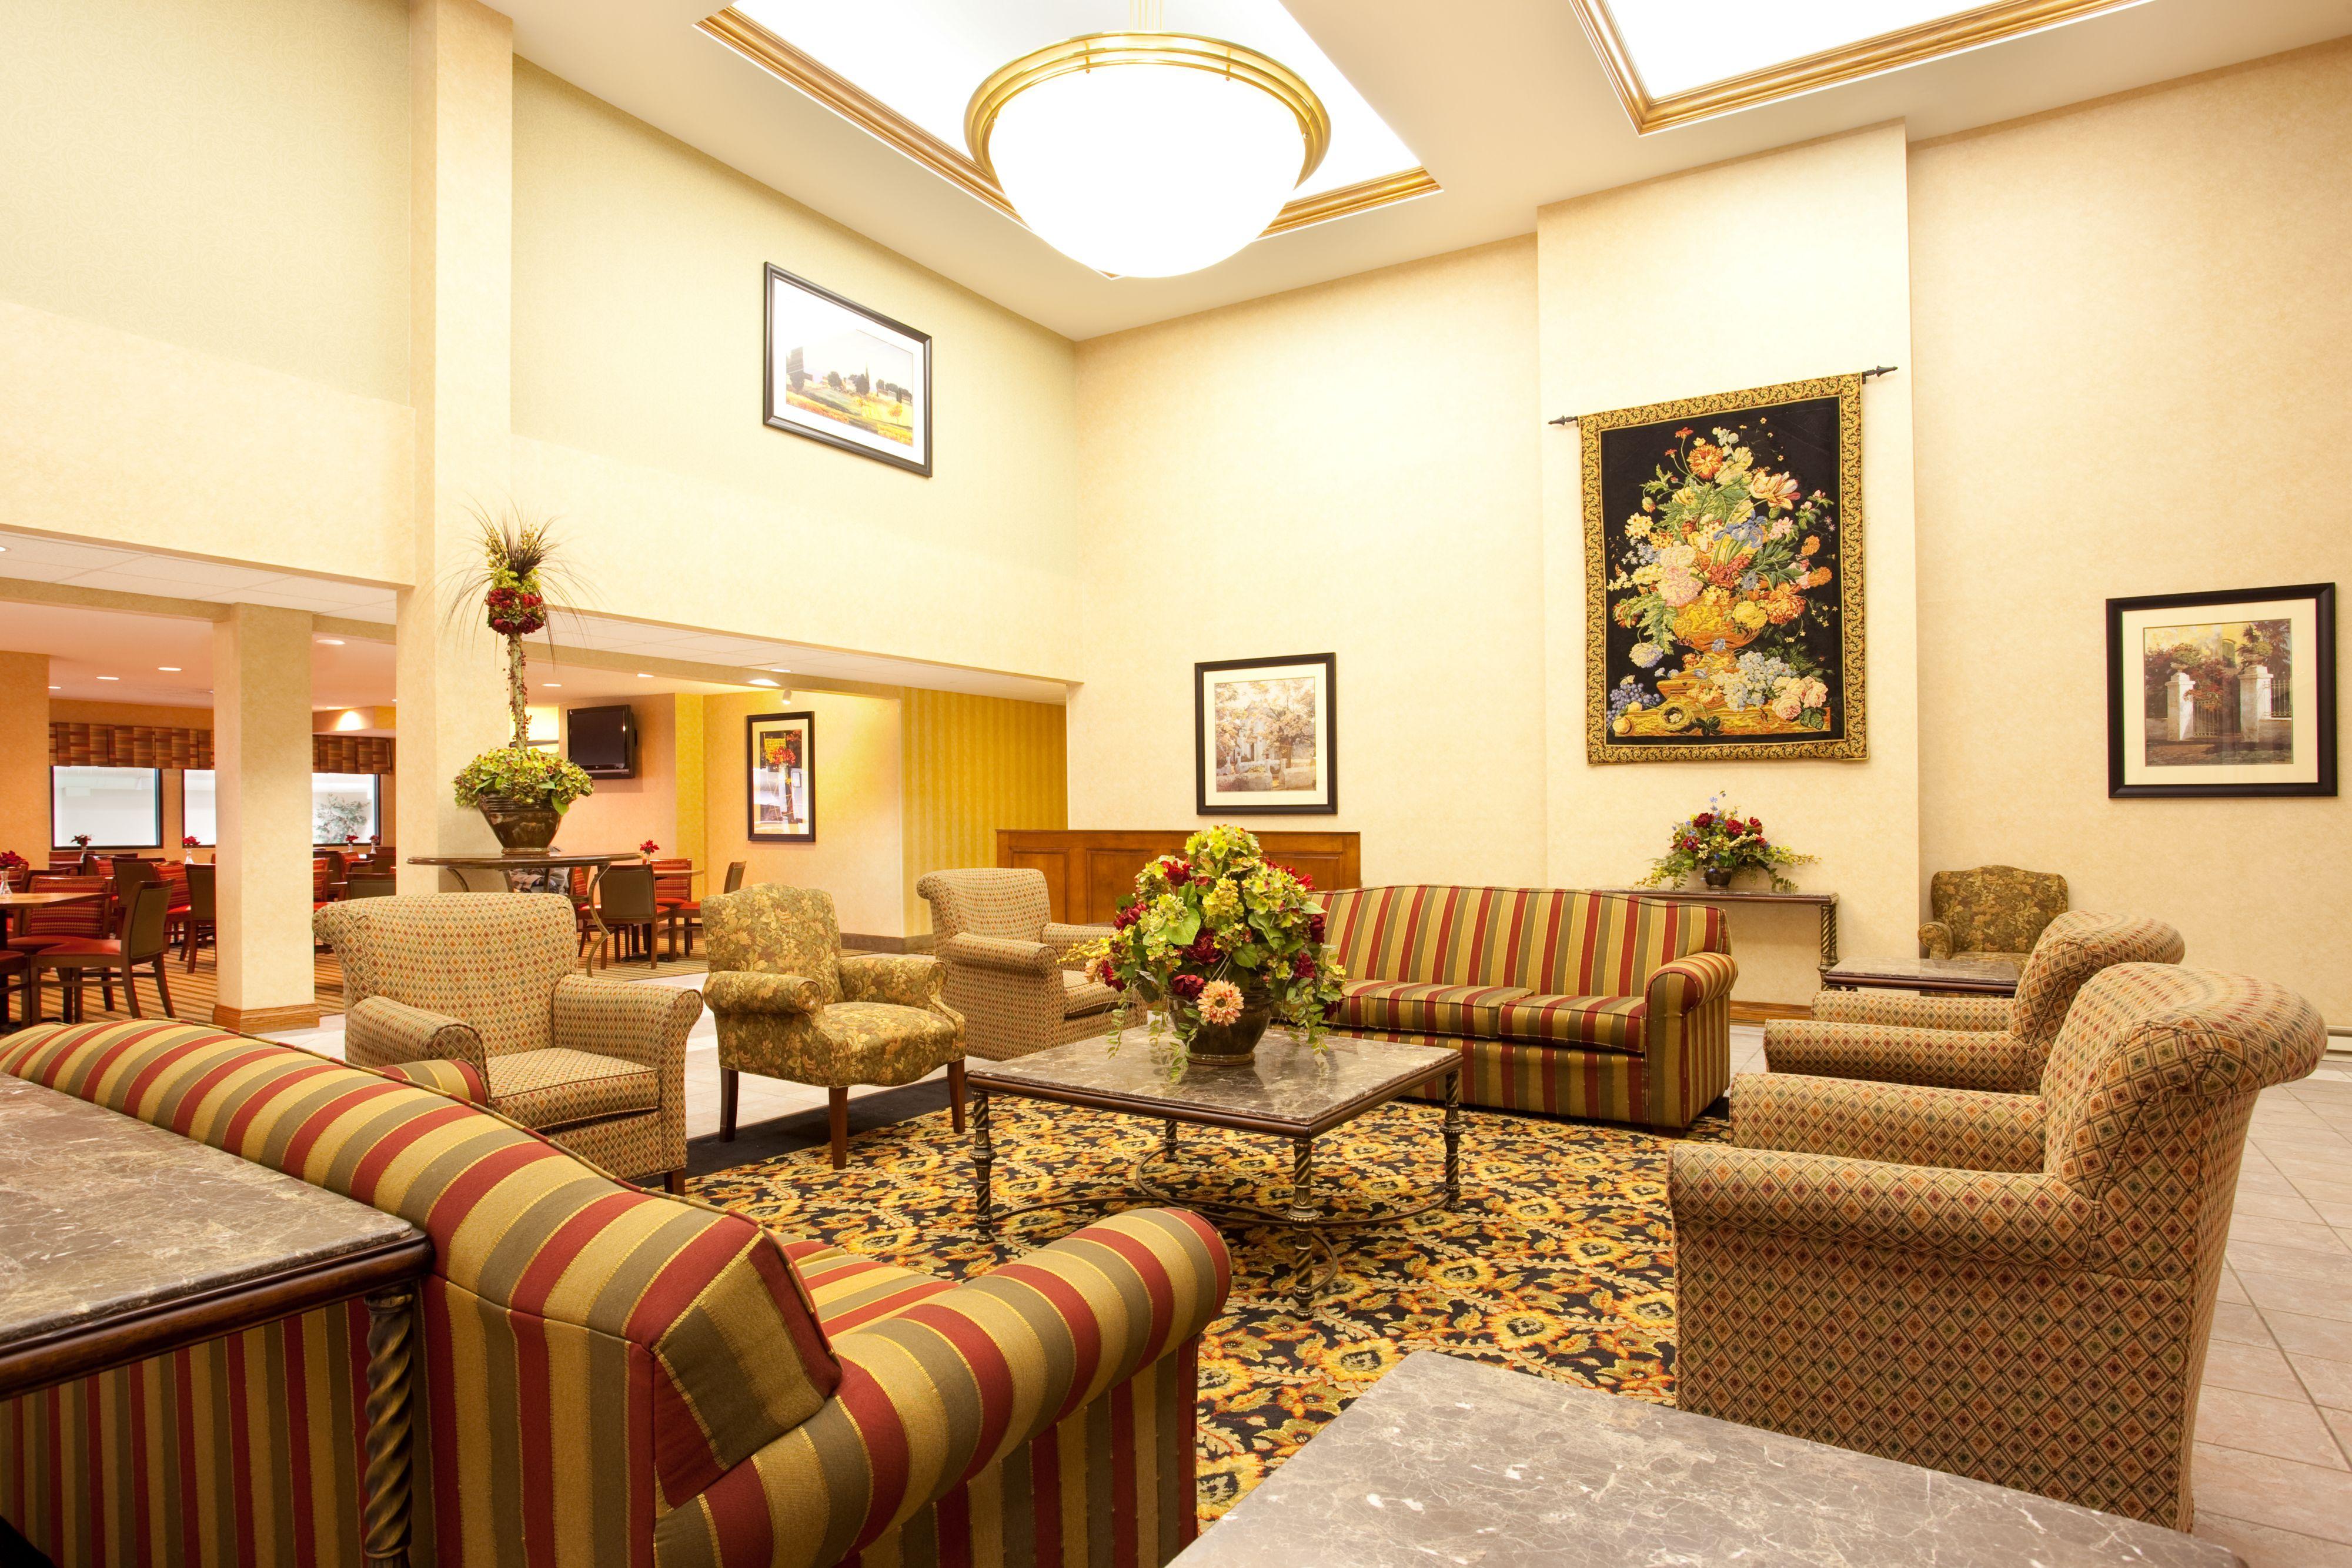 Holiday Inn Express & Suites Bourbonnais (Kankakee/Bradley) image 4